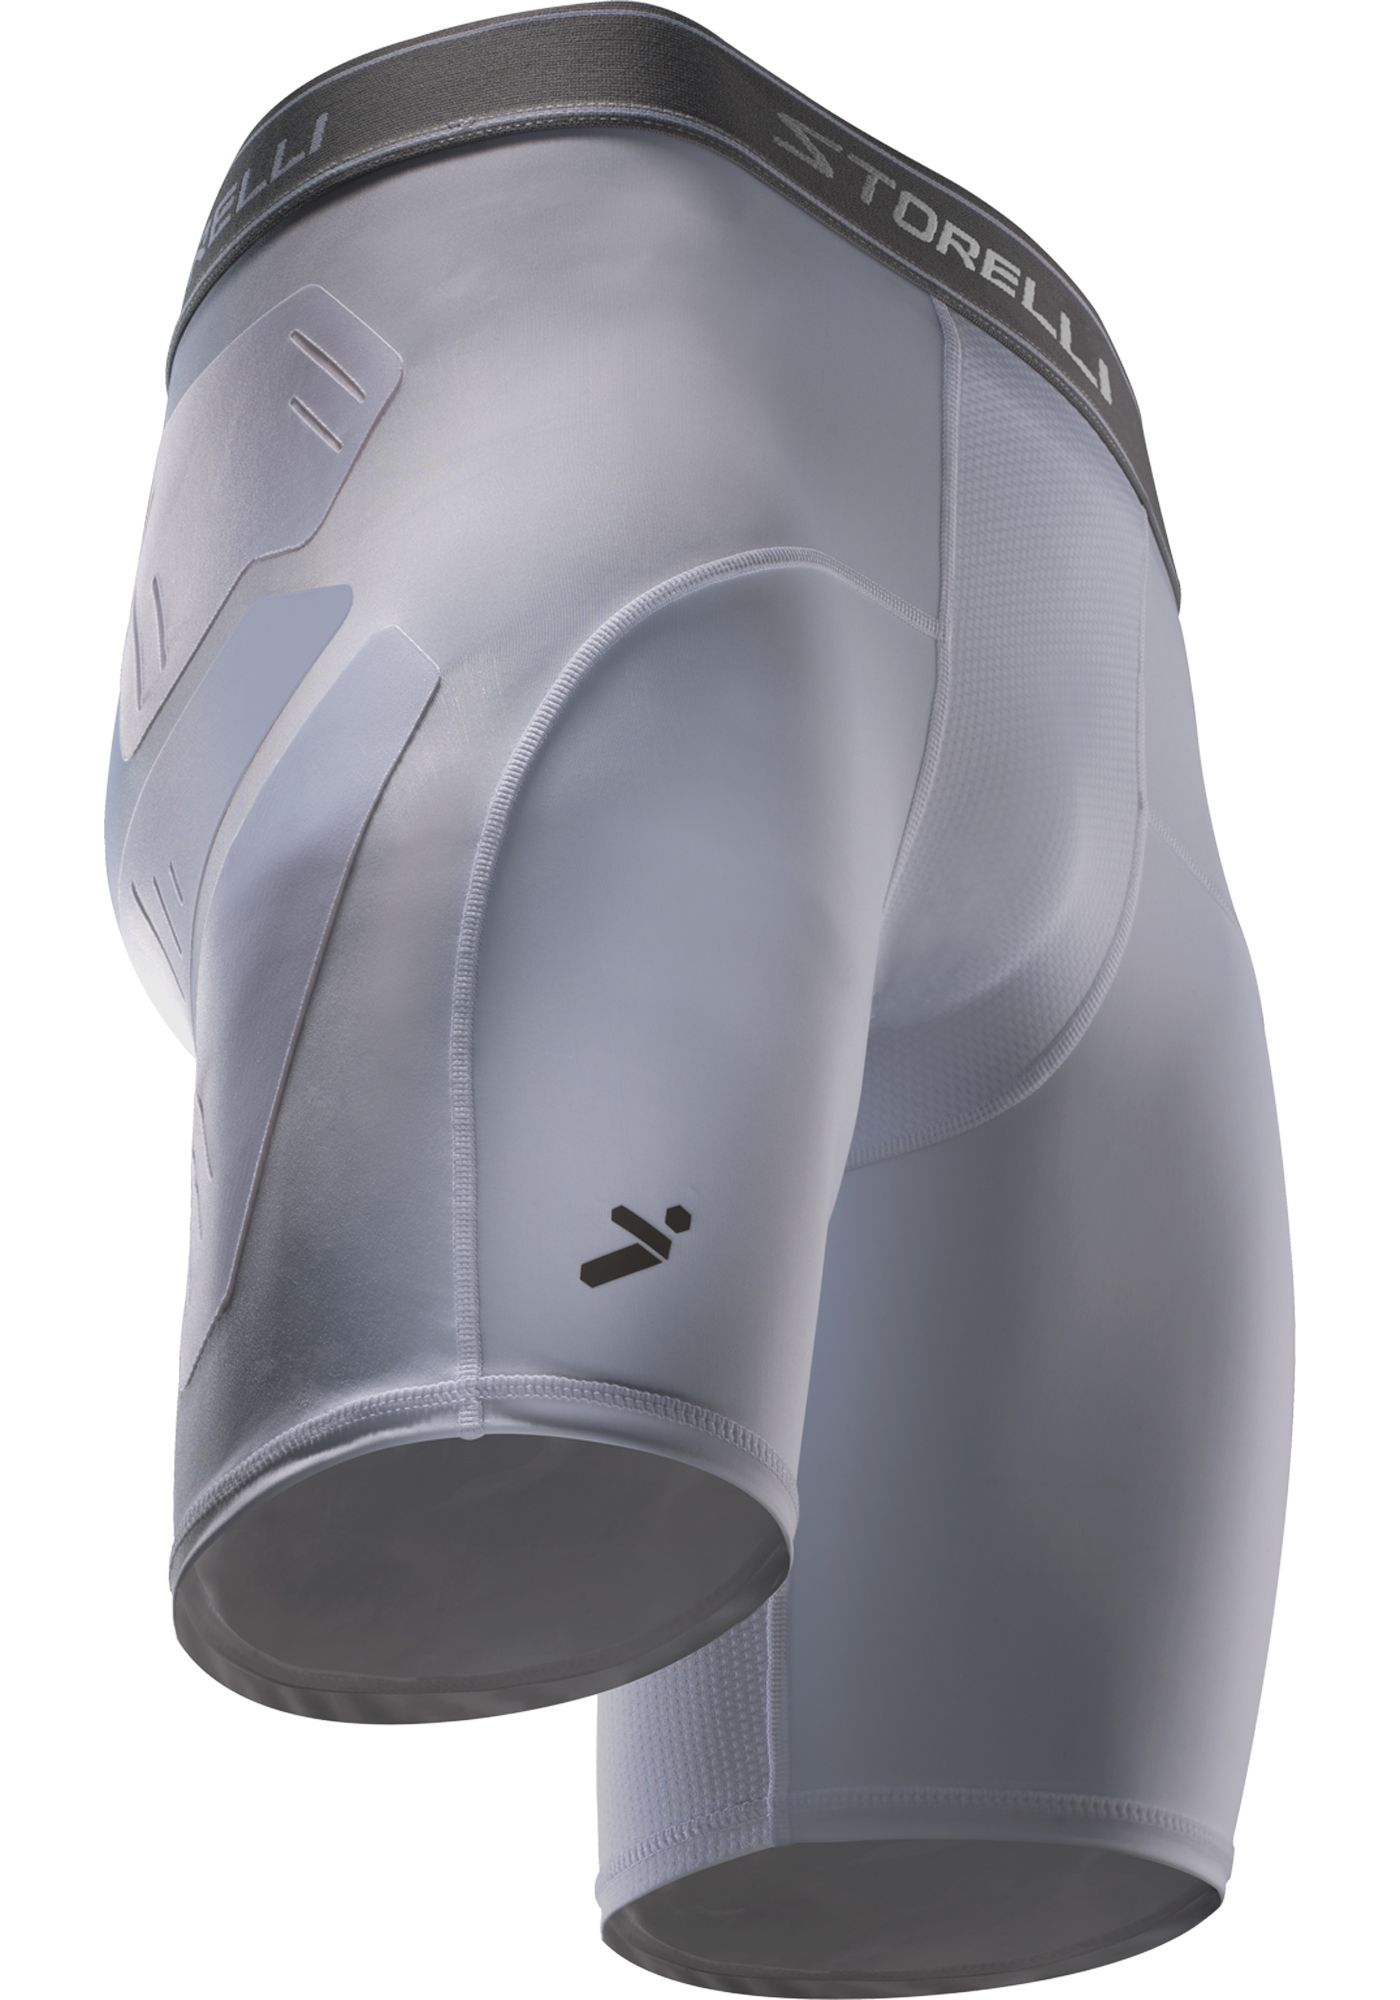 Storelli Adult BodyShield Anti-Abrasion Soccer Sliders